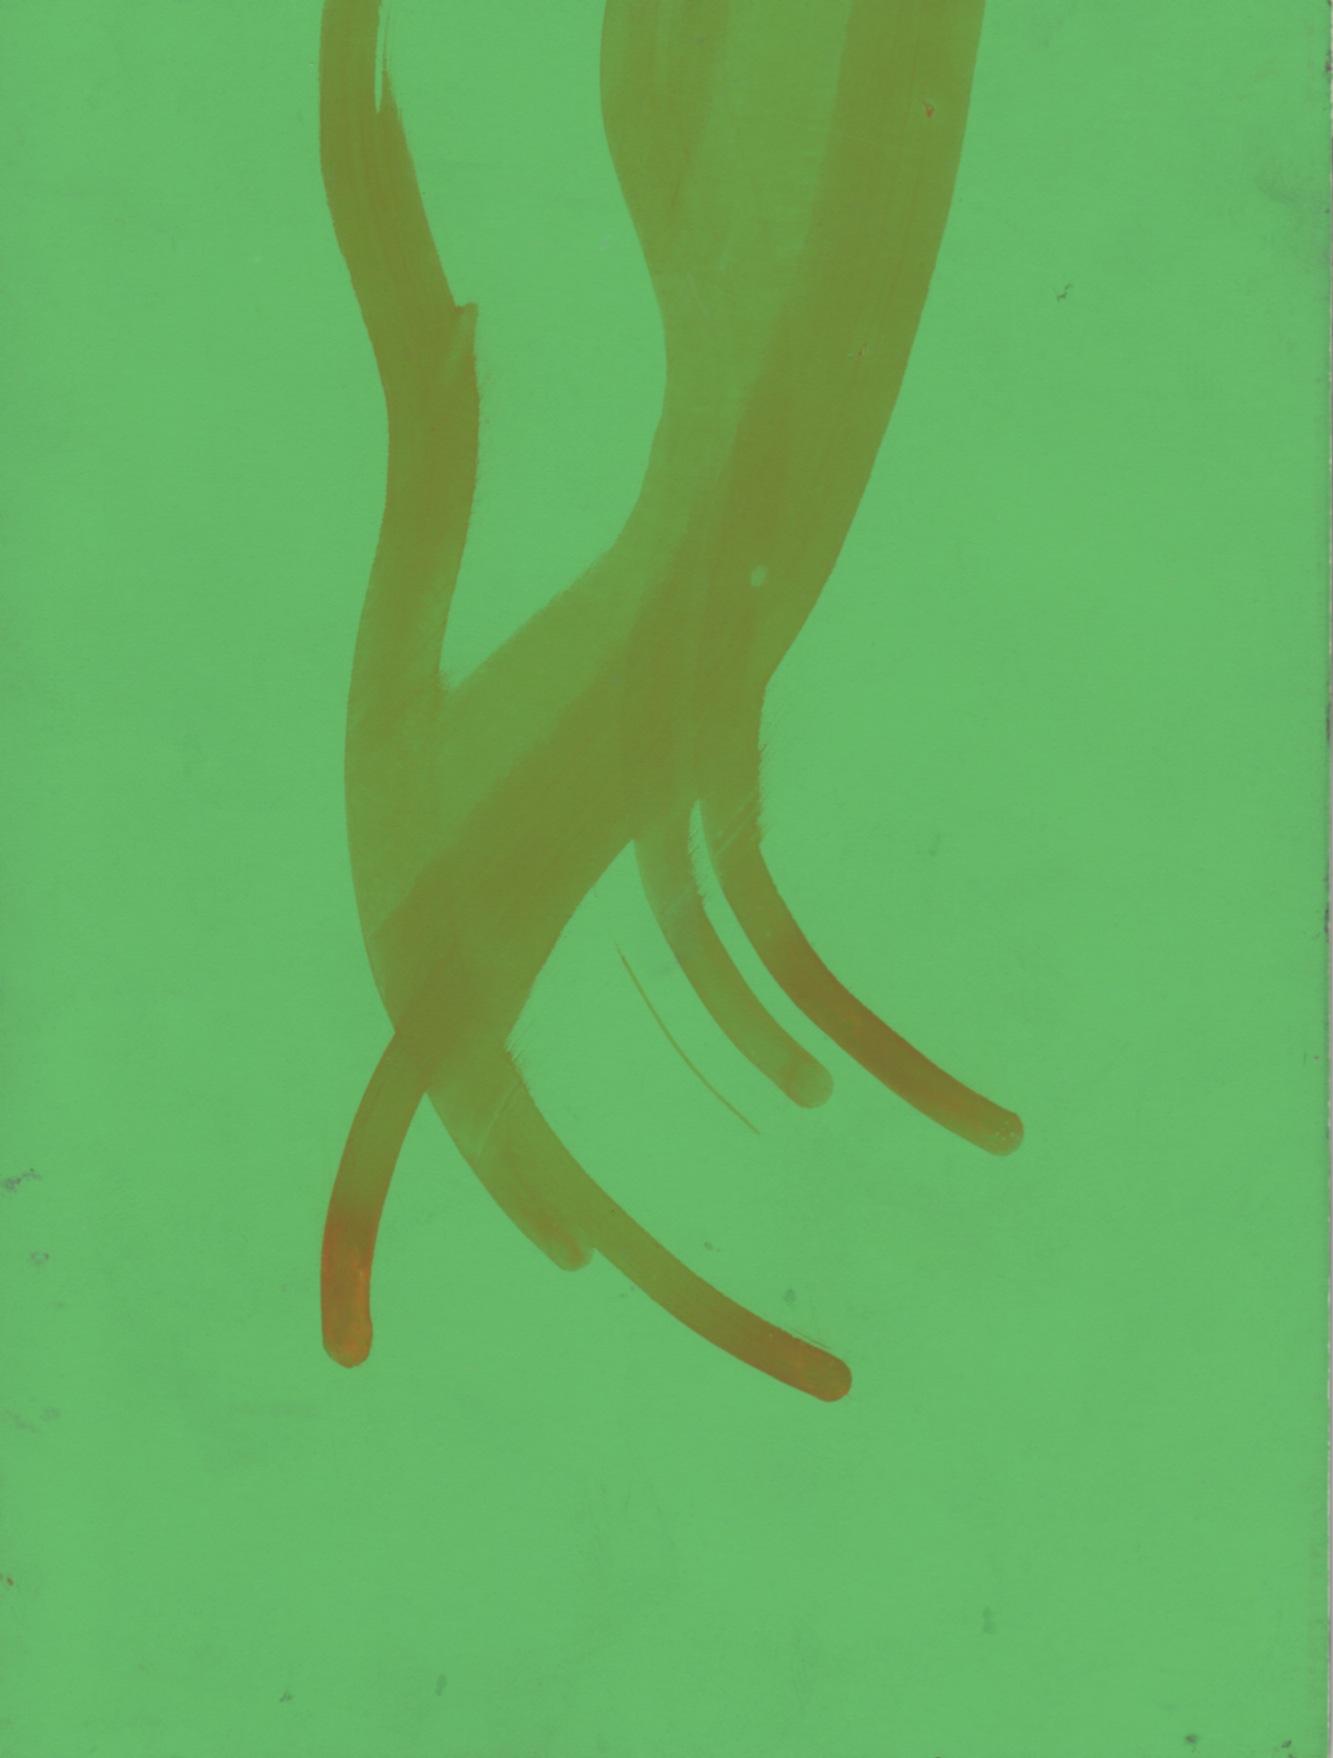 flowchart 13 , 2012  ink on paper, 7 x 5 in